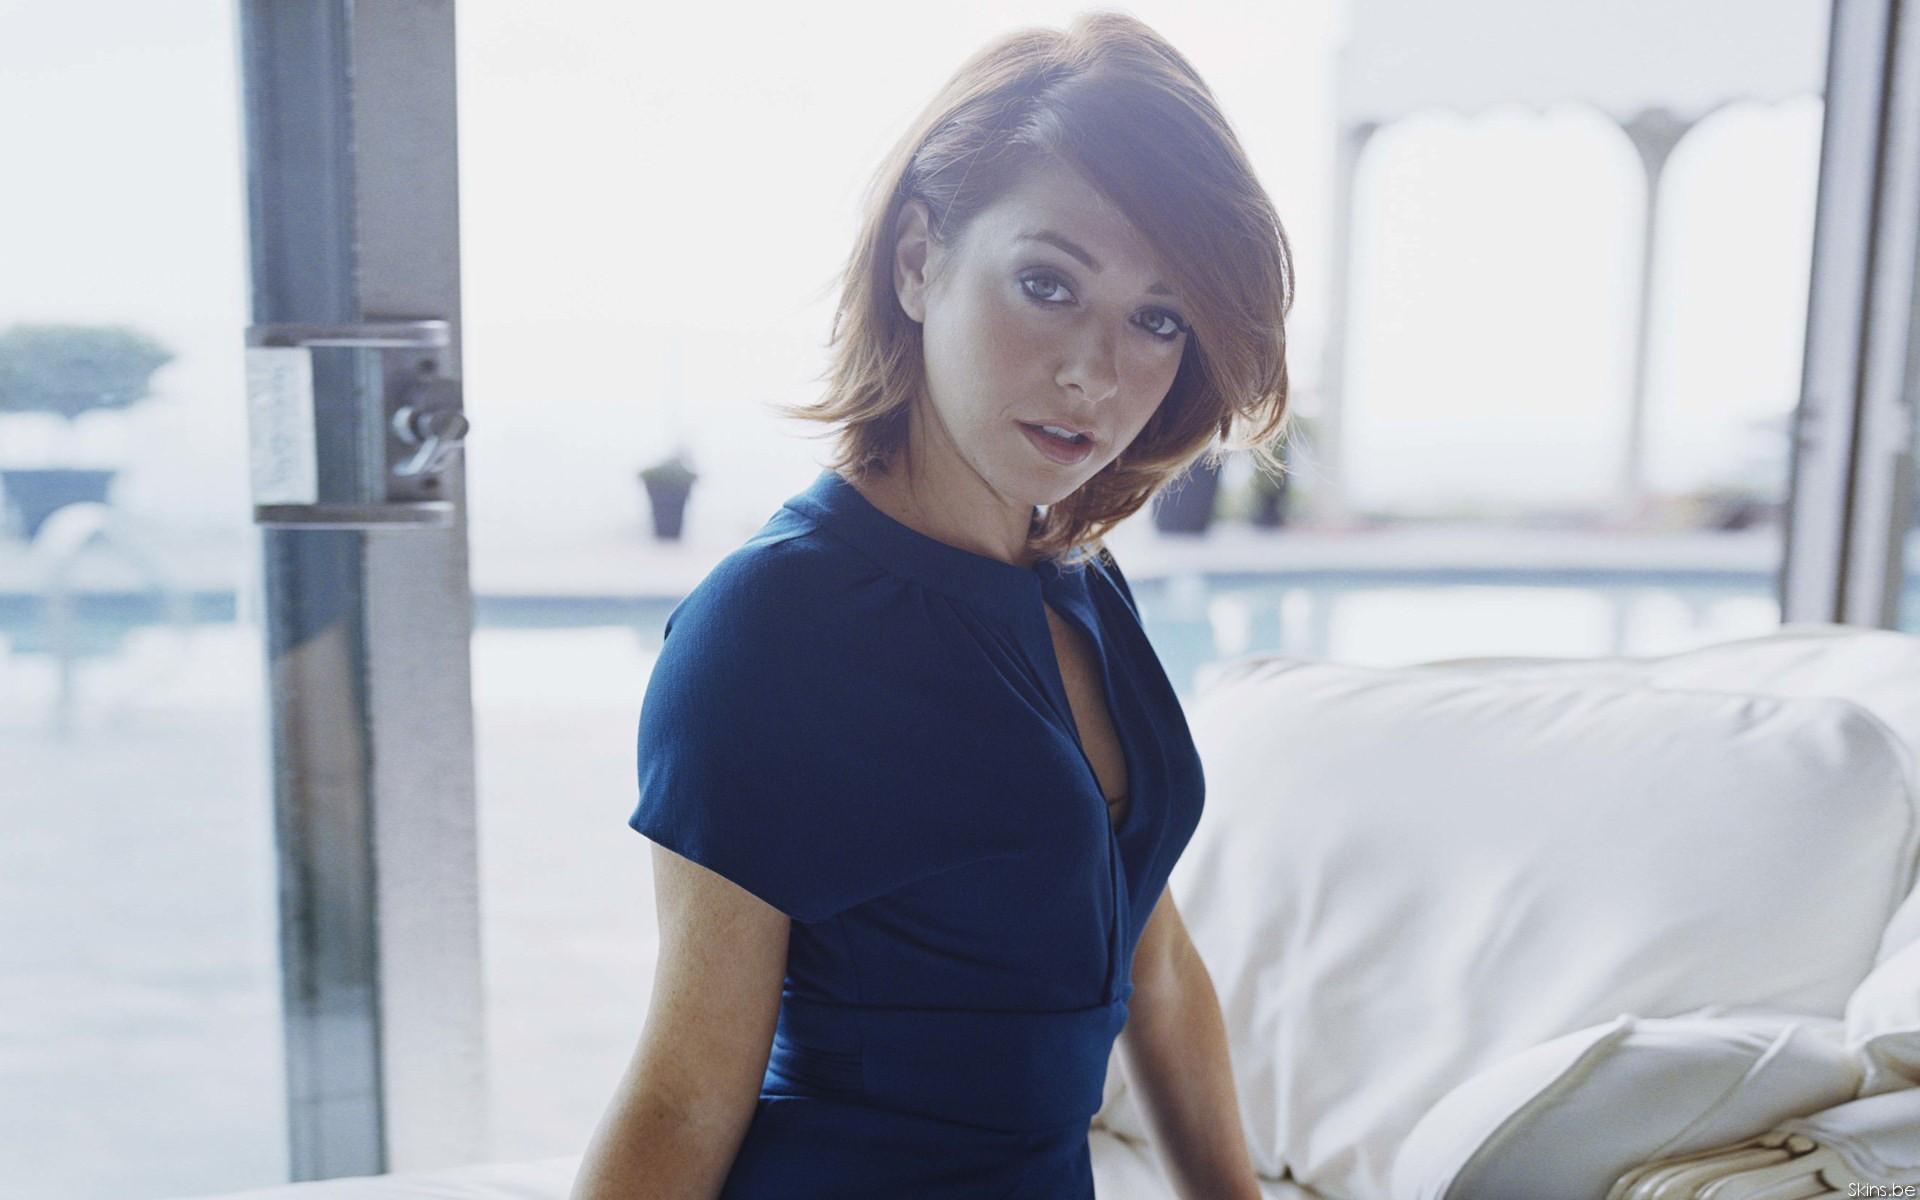 Women Alyson Hannigan Actress Redhead Blue Clothes Blue Clothing Short Hair Wallpaper Resolution 1920x1200 Id 375668 Wallha Com